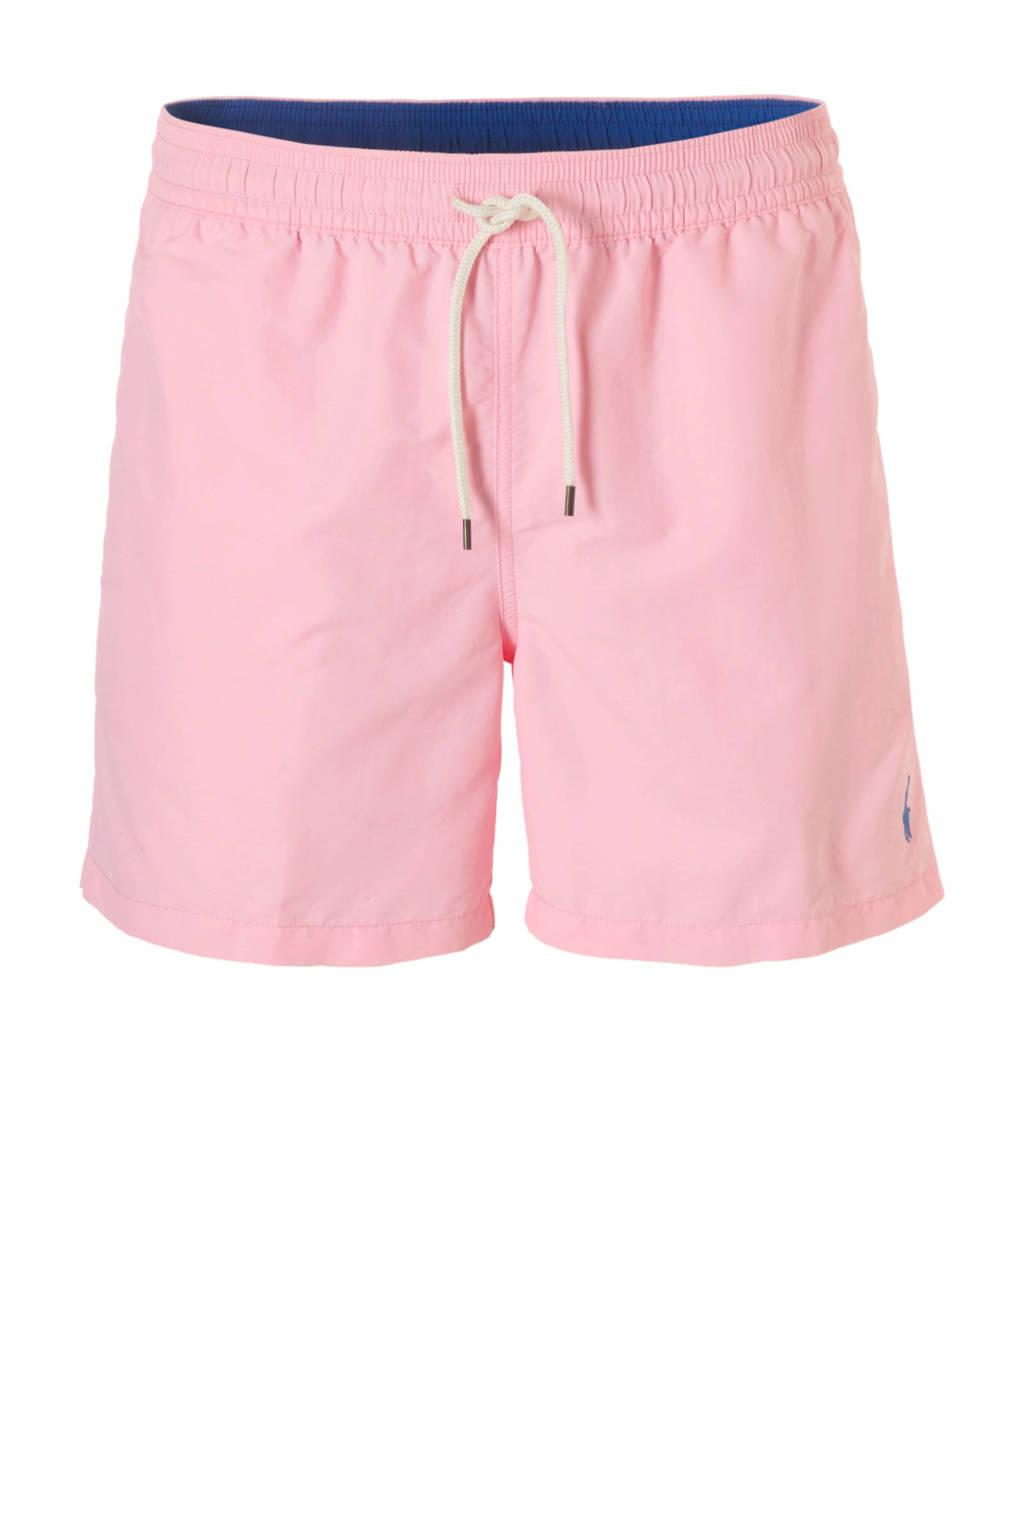 POLO Ralph Lauren zwemshort met zakken roze, Roze